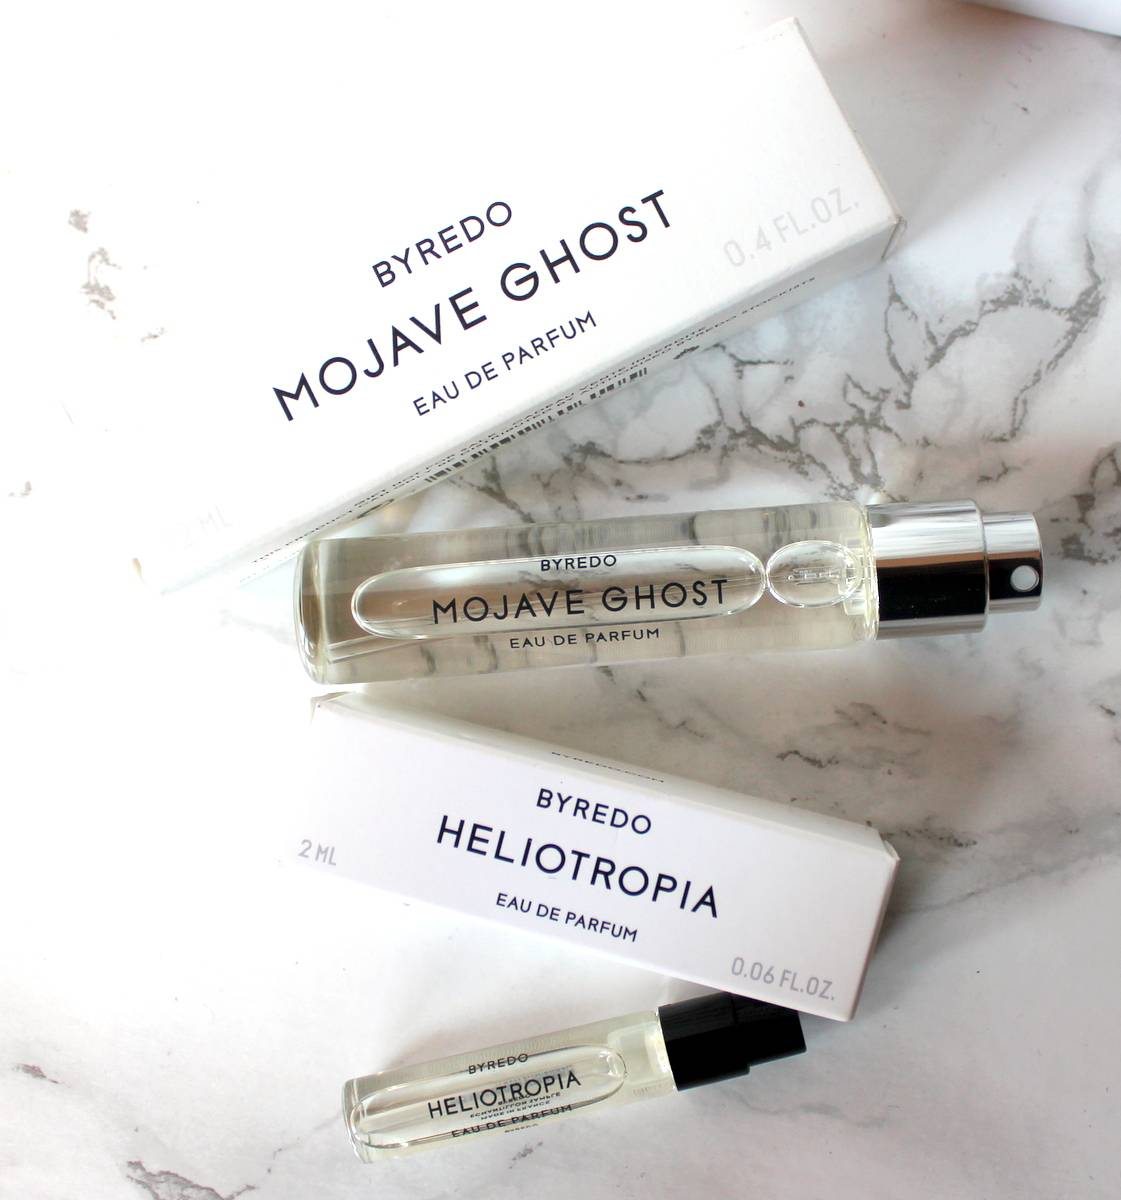 Byredo Mojave Ghost and Heliotropia